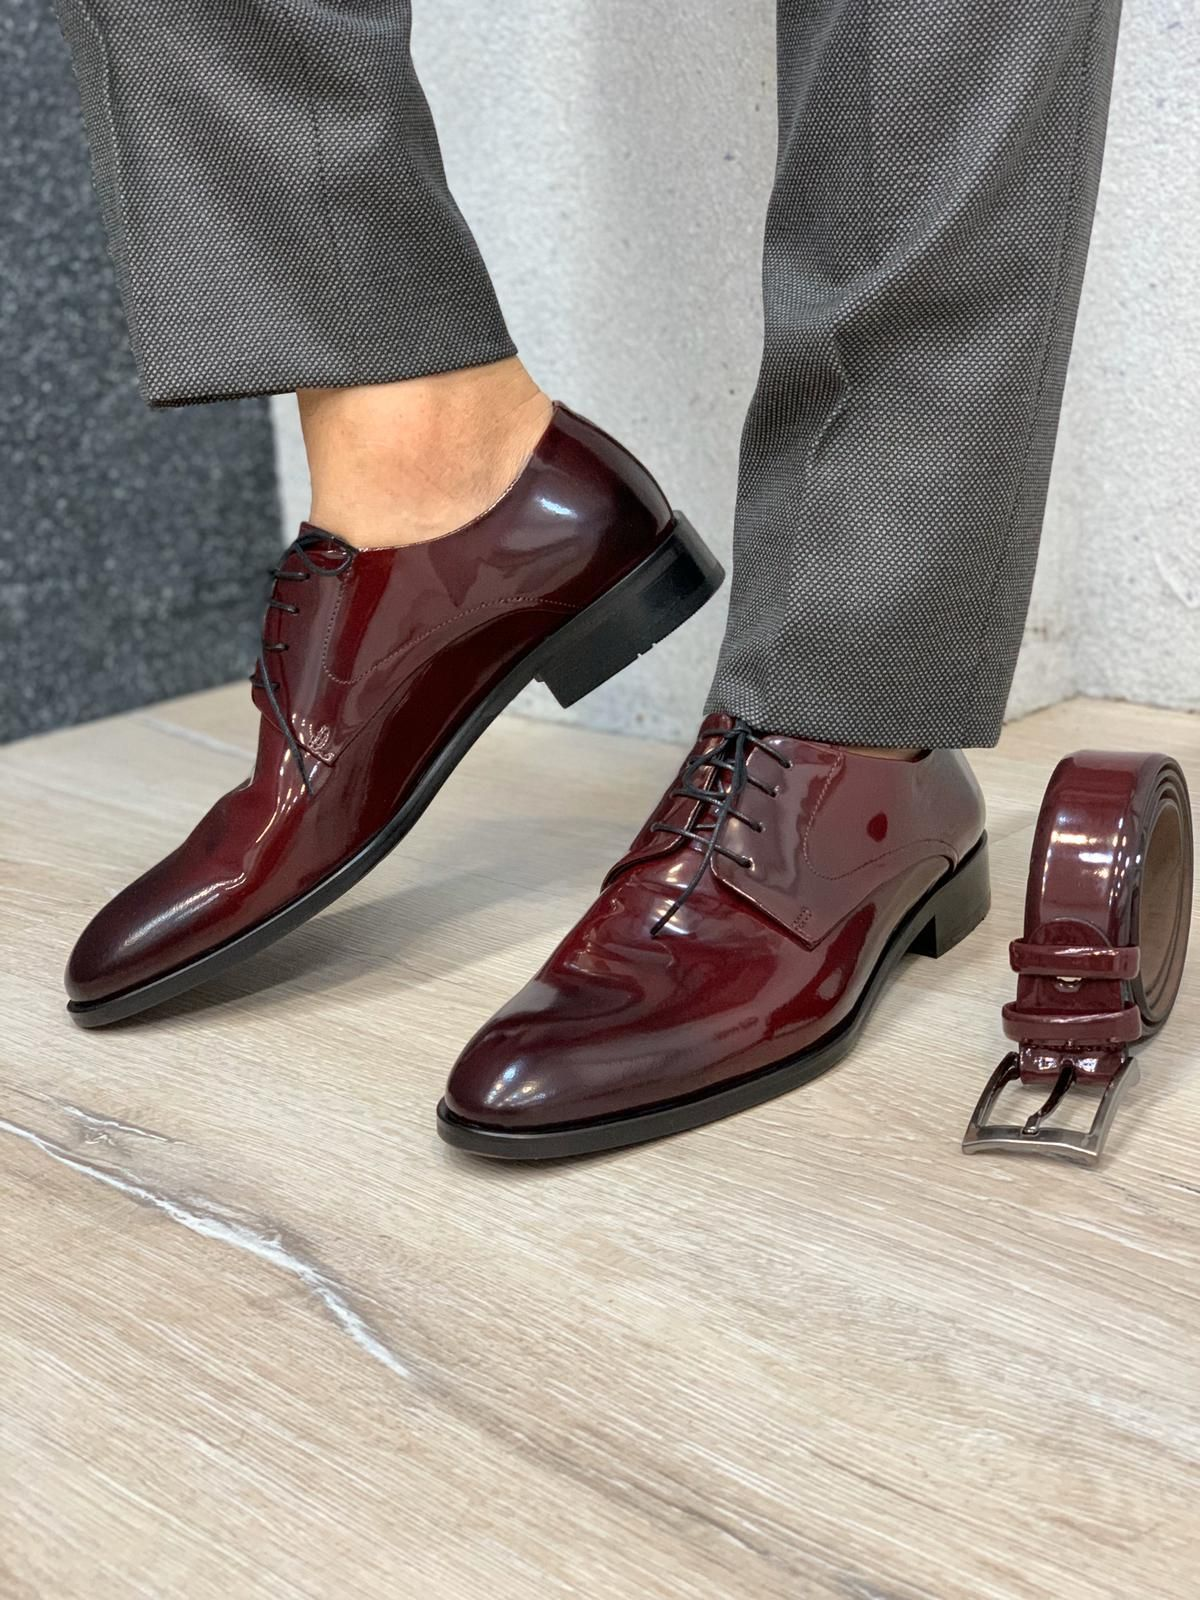 Patent Brugundy Leather Shoes – Belt